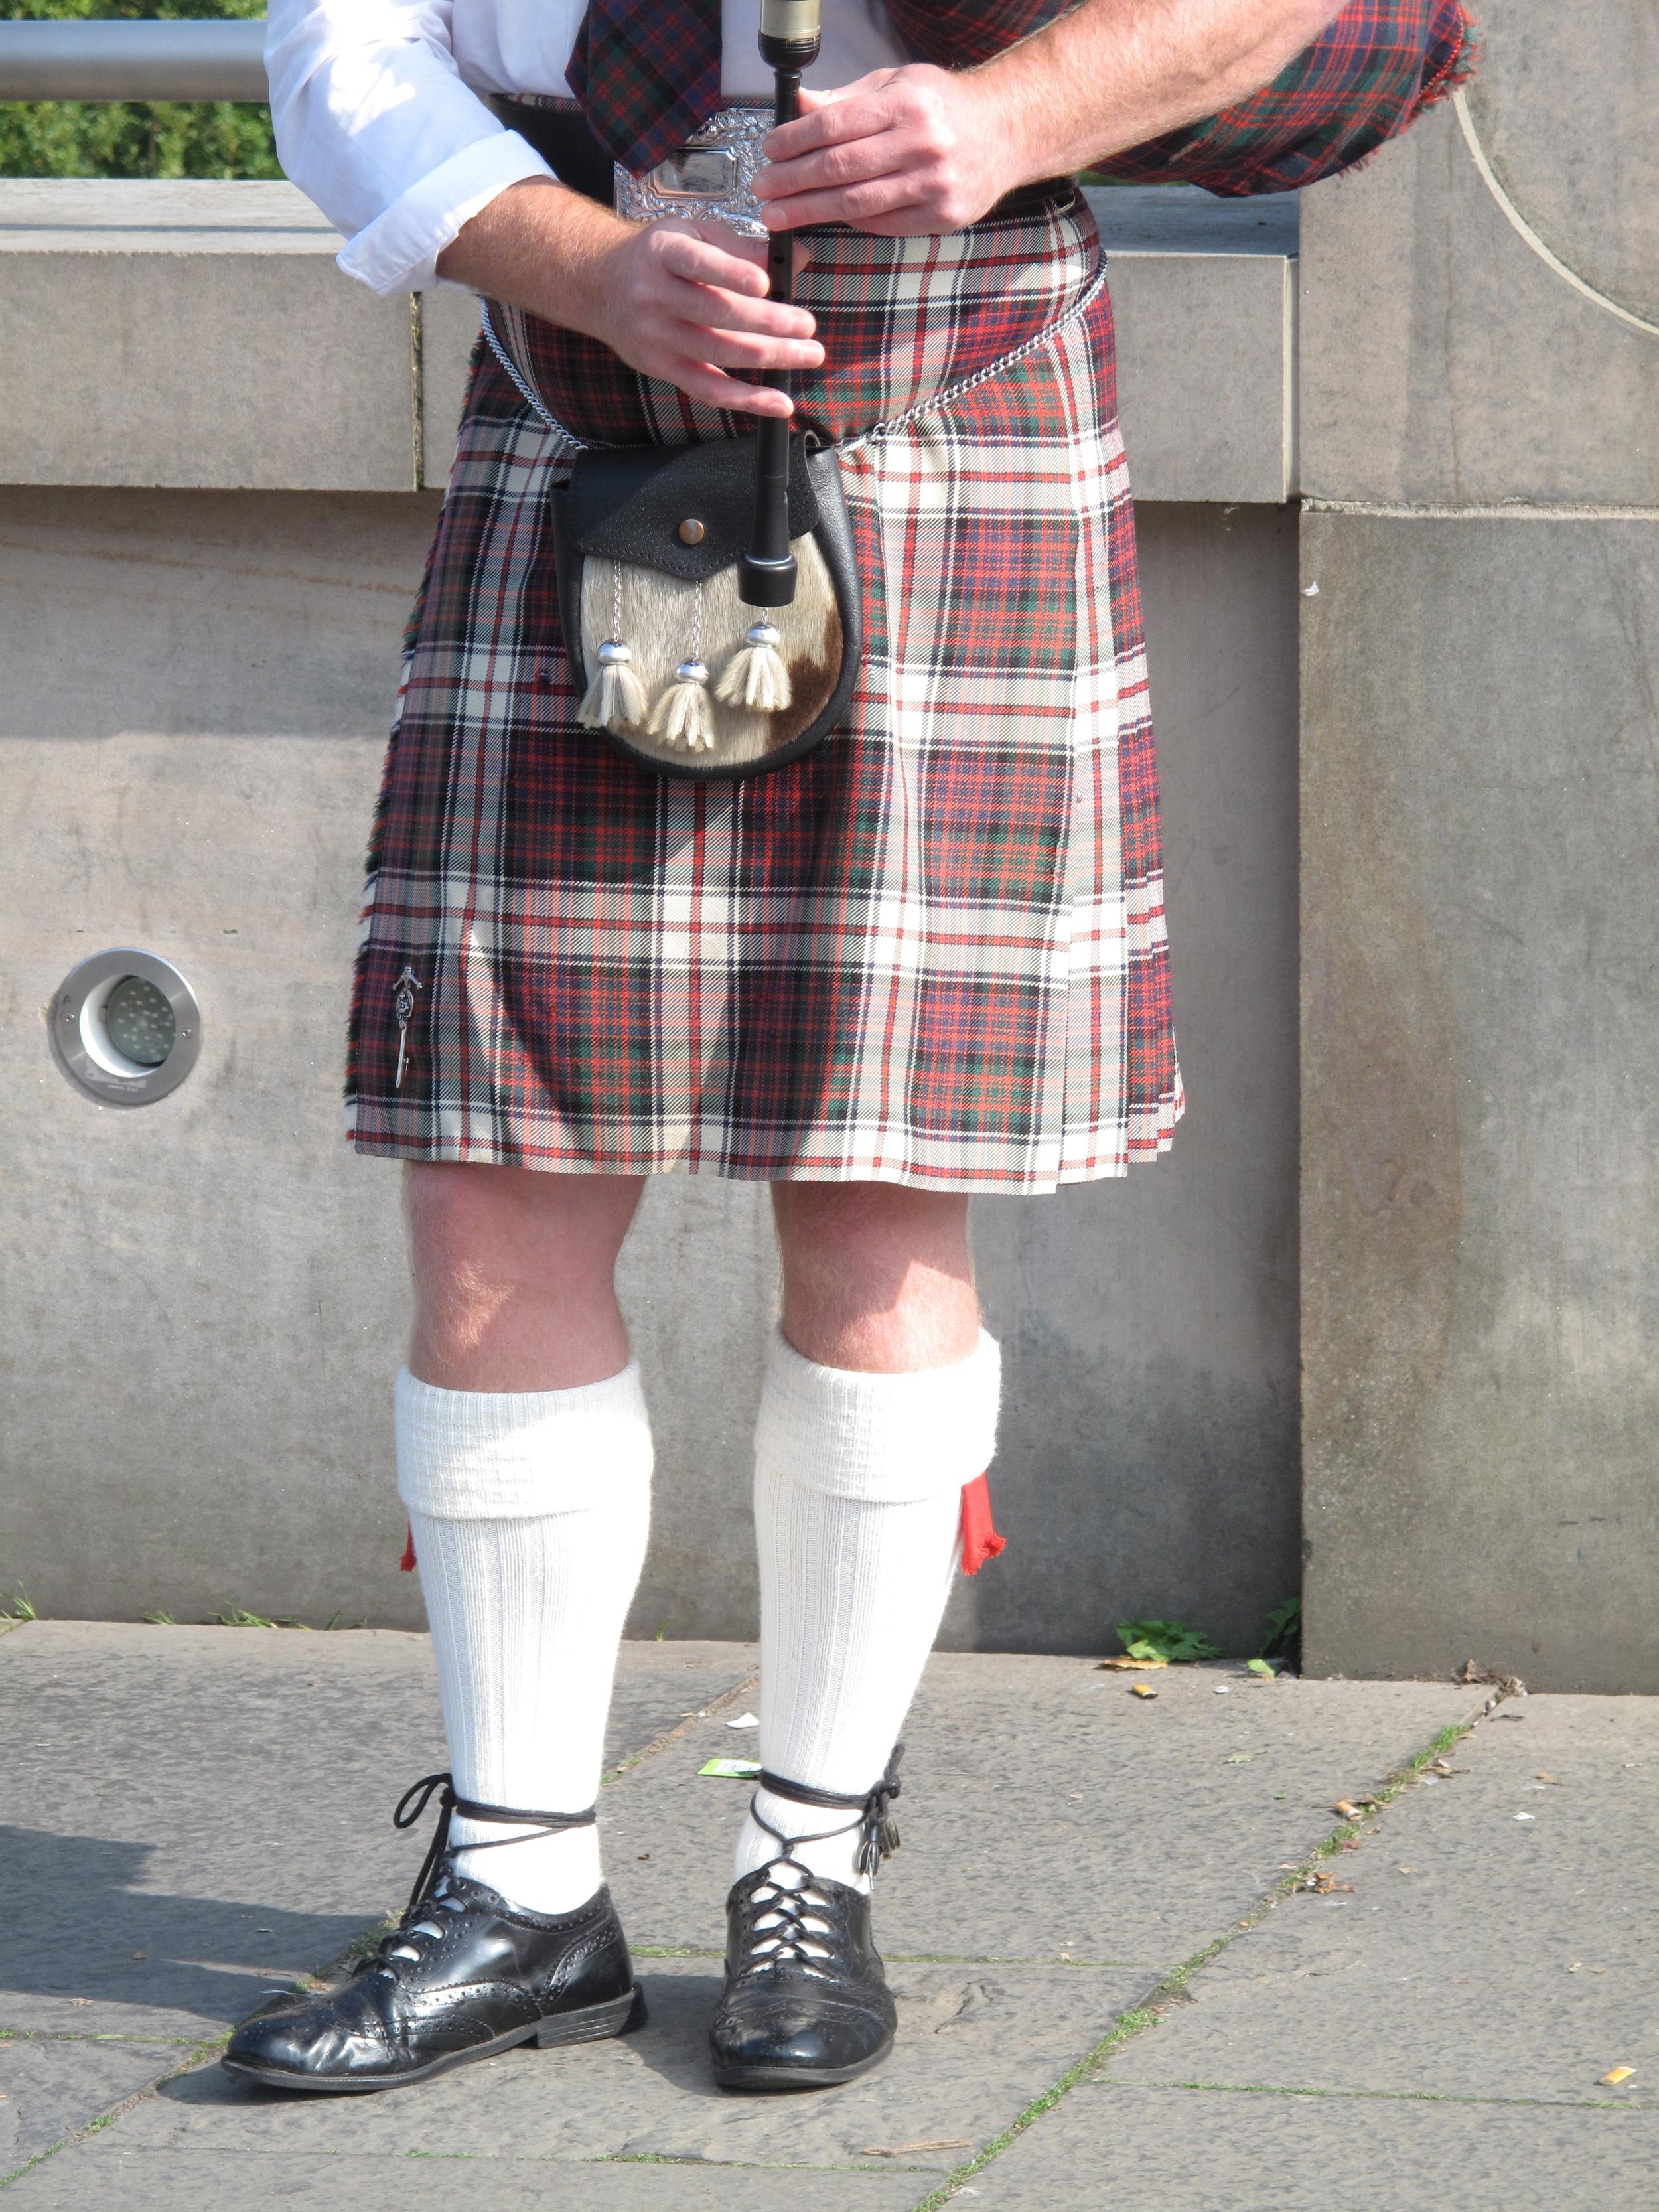 Kilt of a bagpiper, Edinburgh.